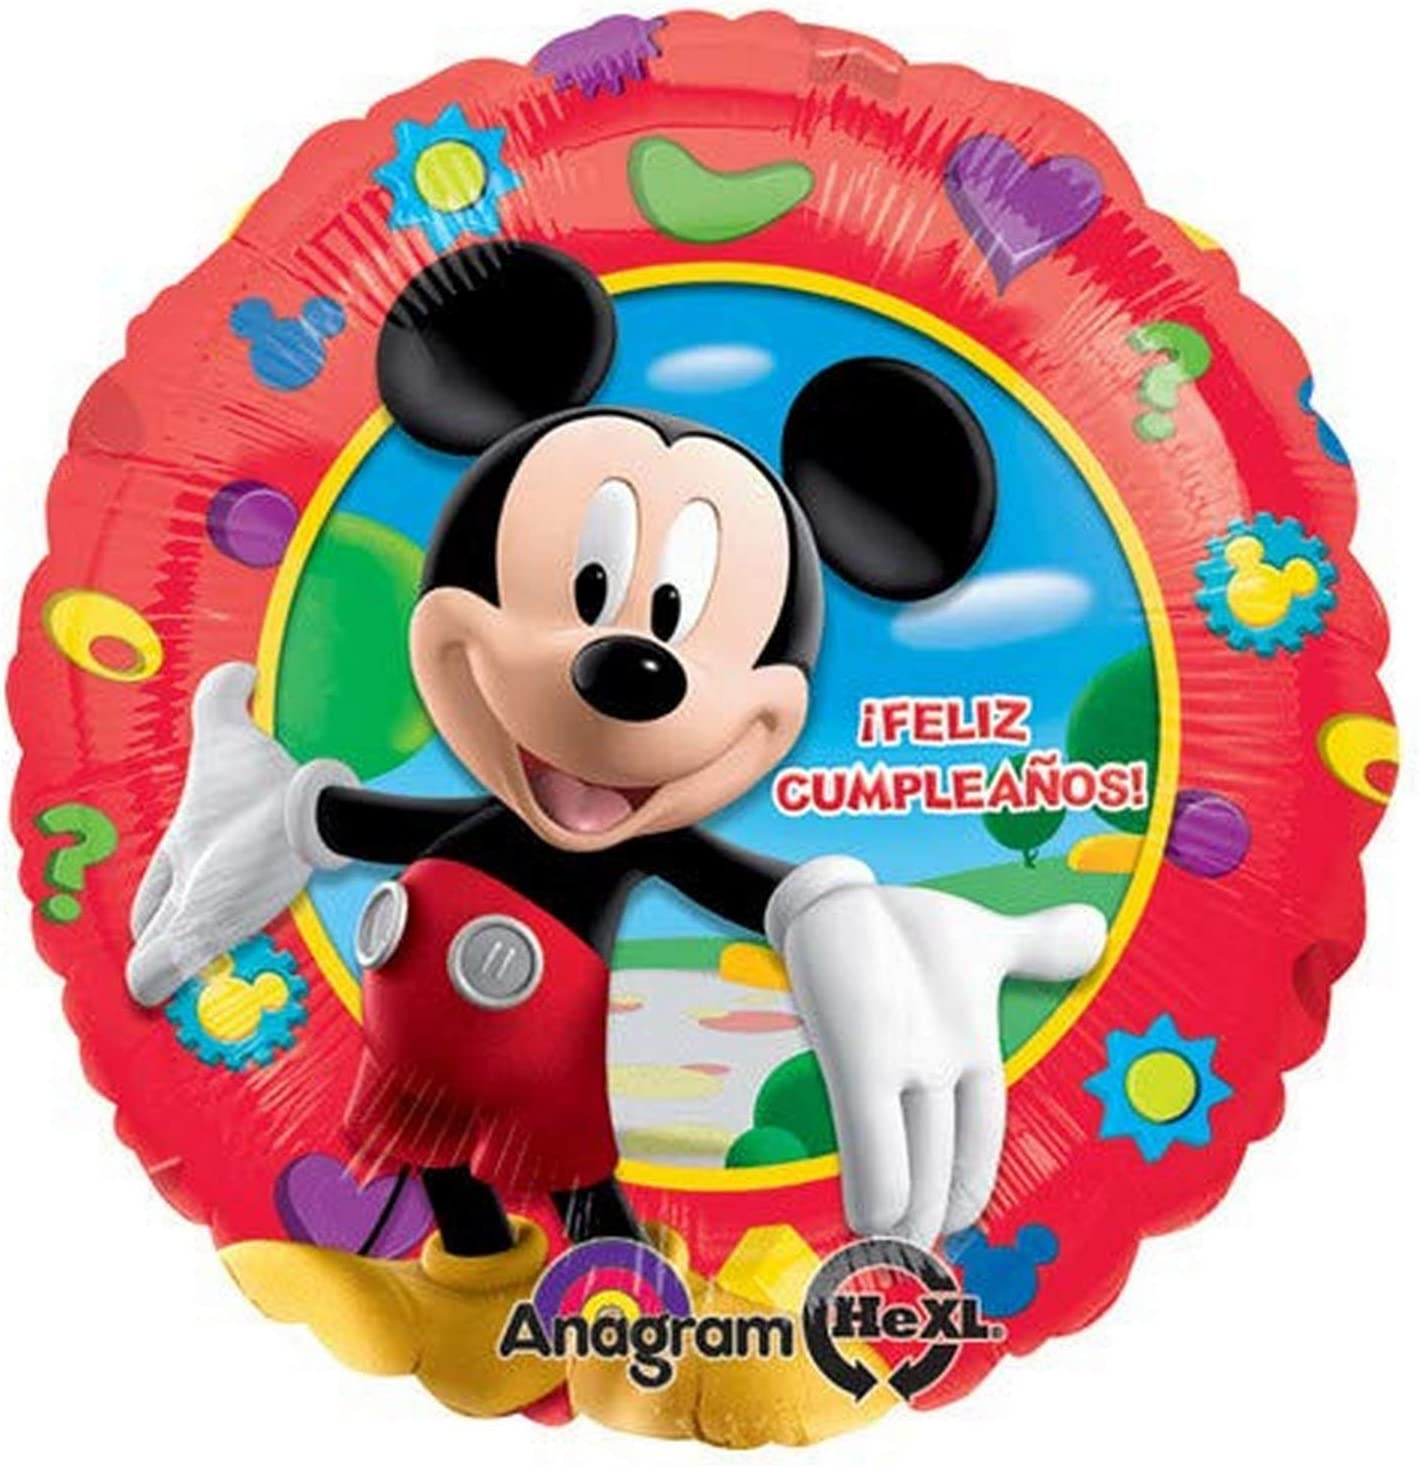 Multicolored Anagram 17873 Mickey Mouse Feliz Cumpleanos Foil Balloon 18